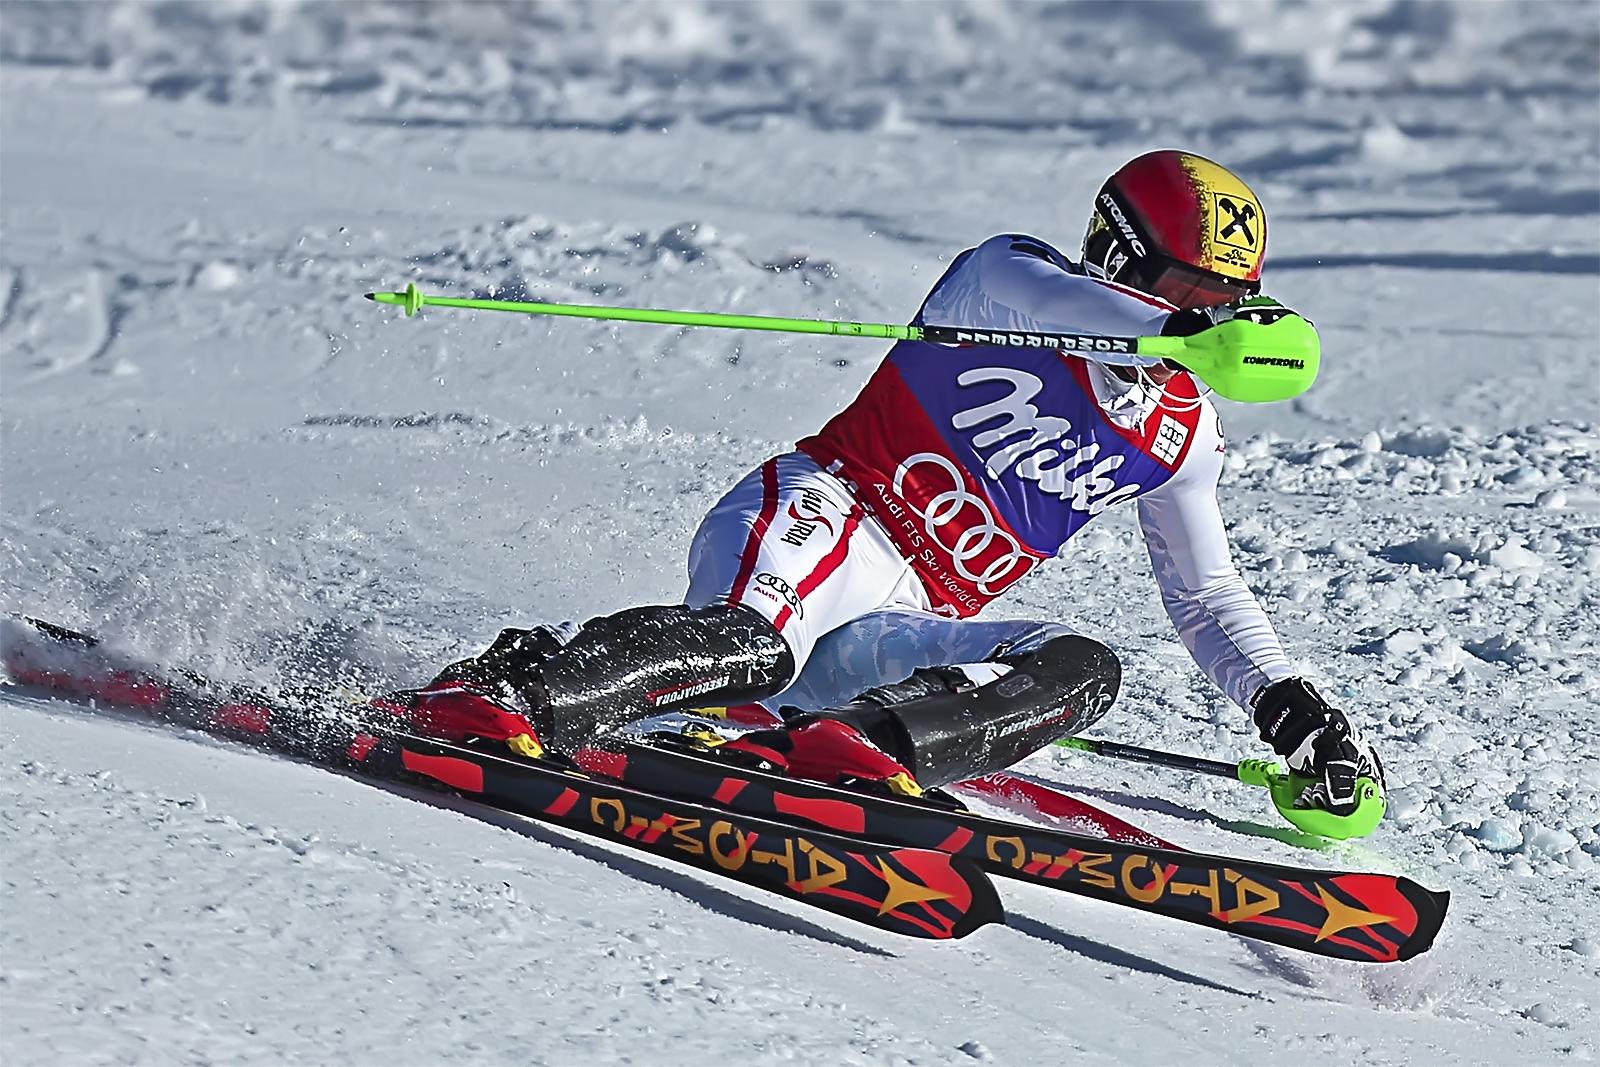 Marcel Hirscher, 2nd in Slalom.